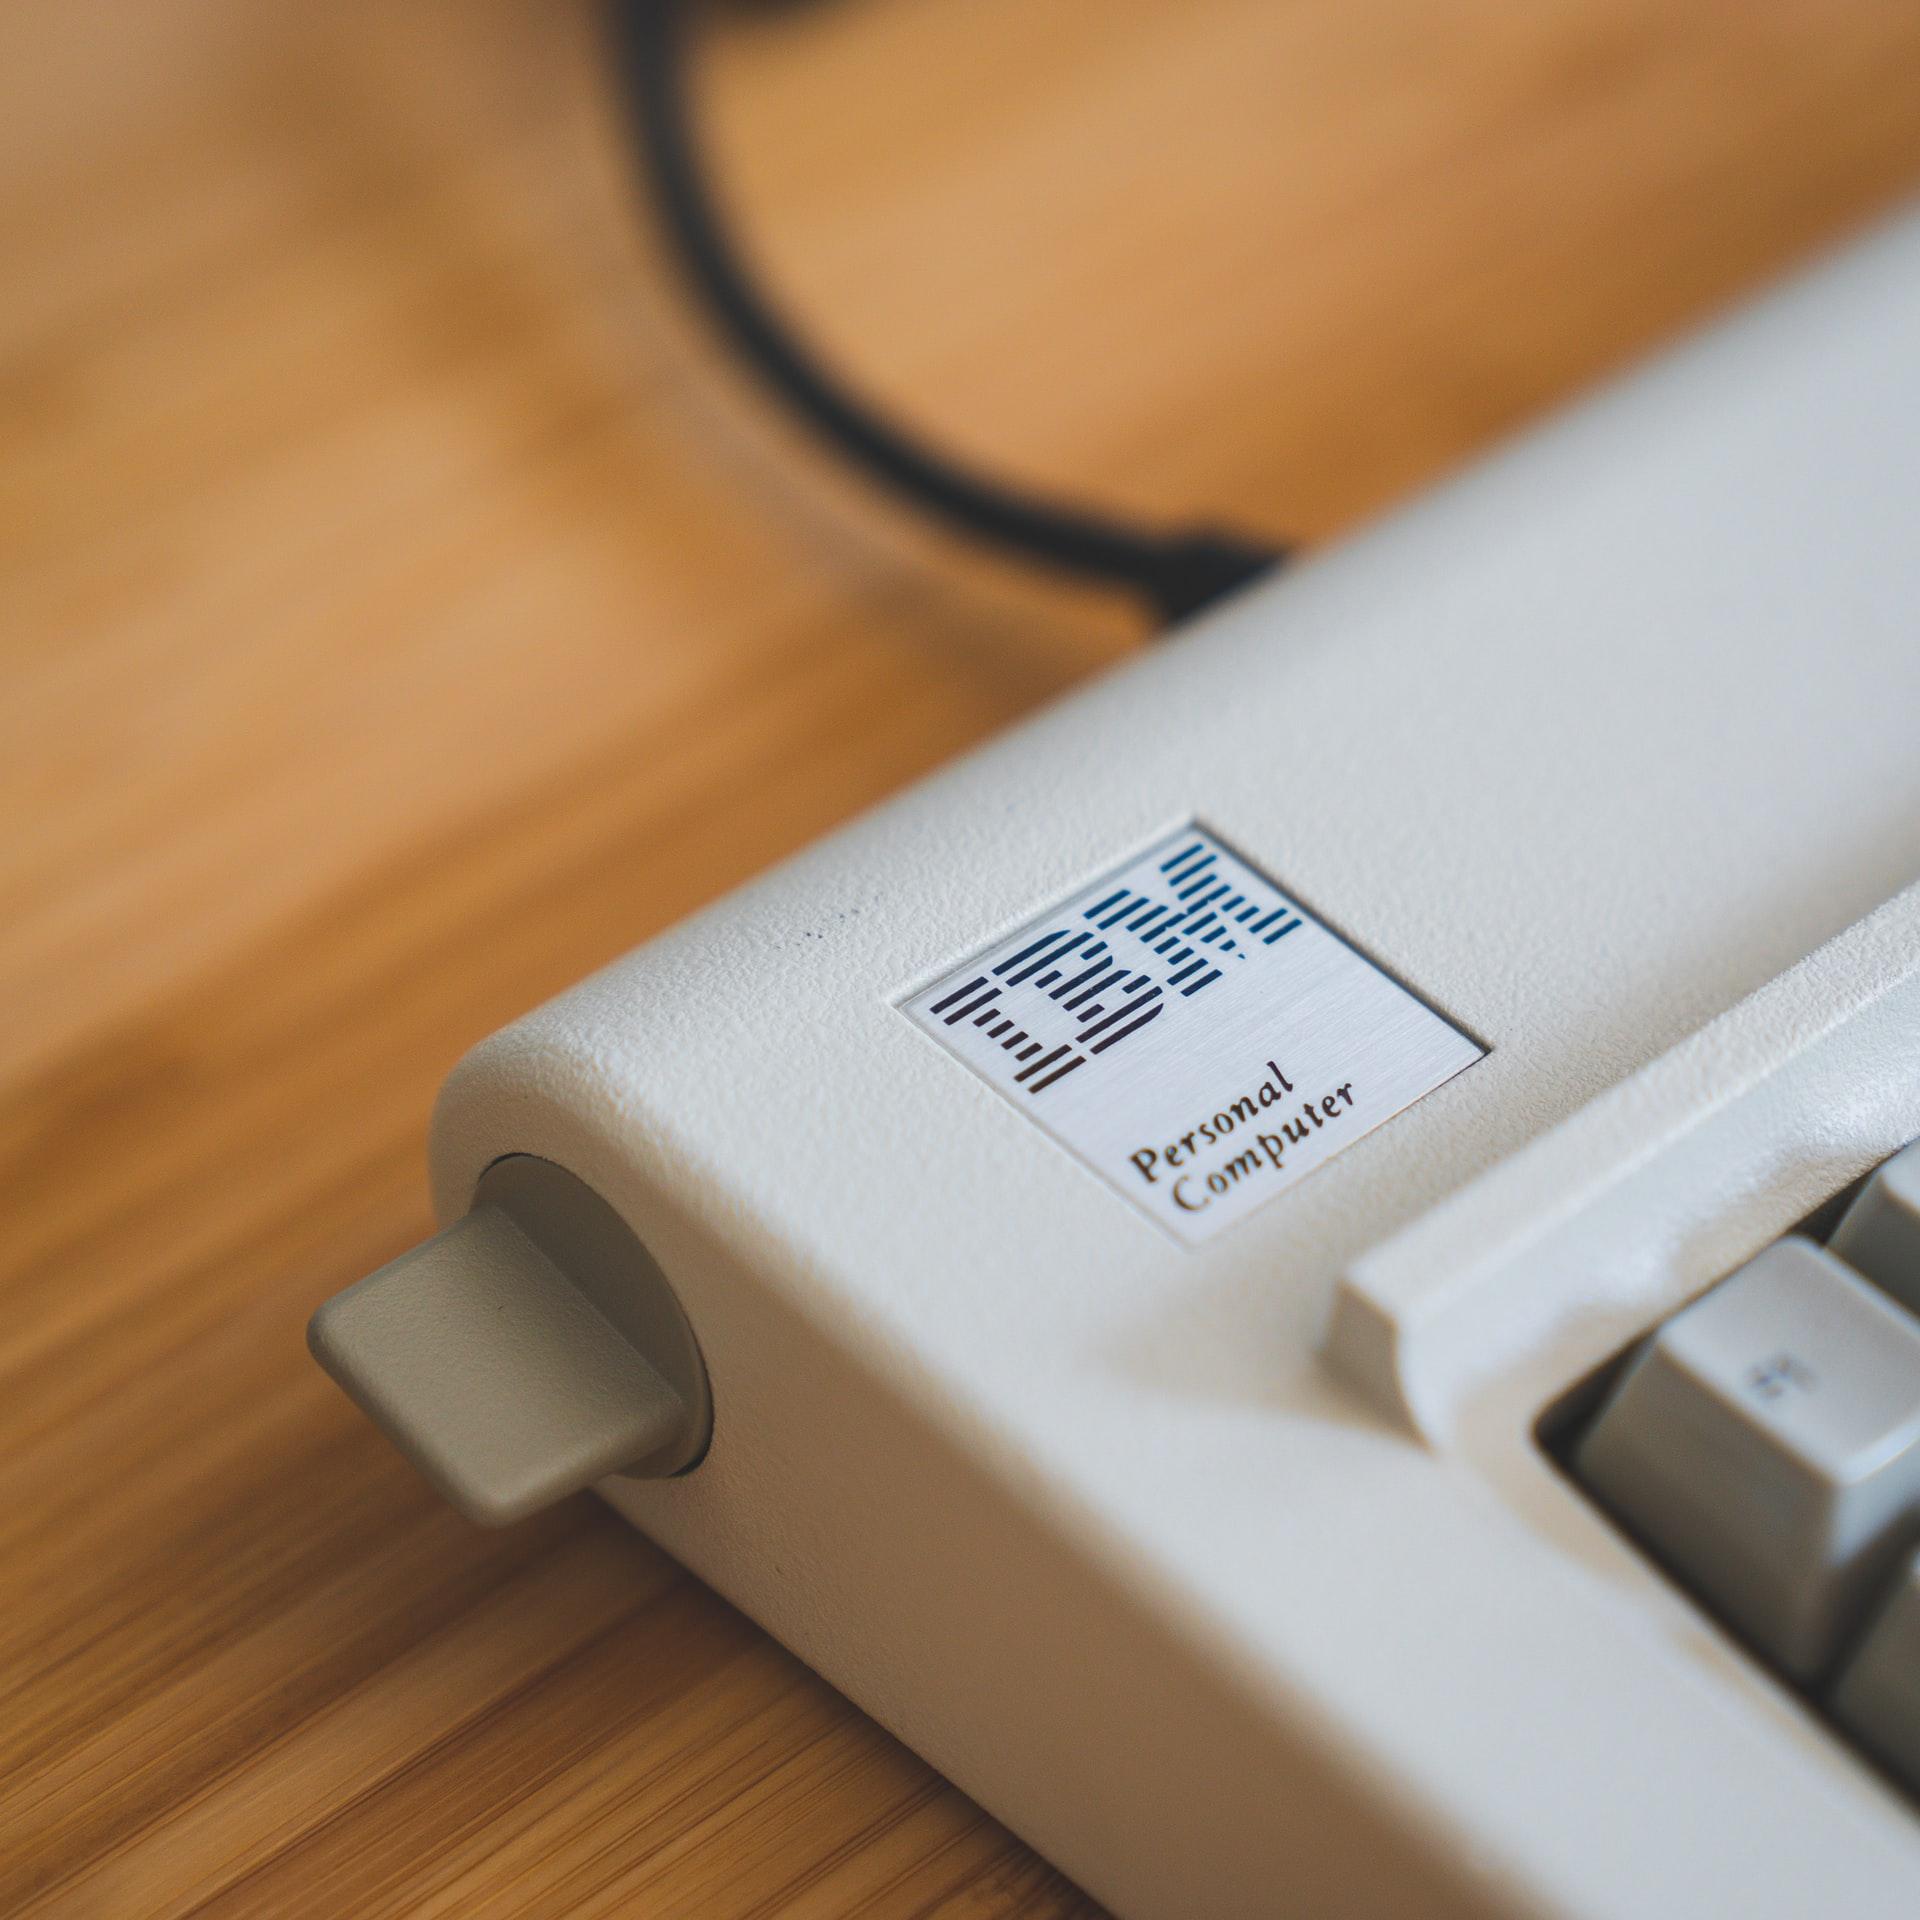 An IBM keyboard.